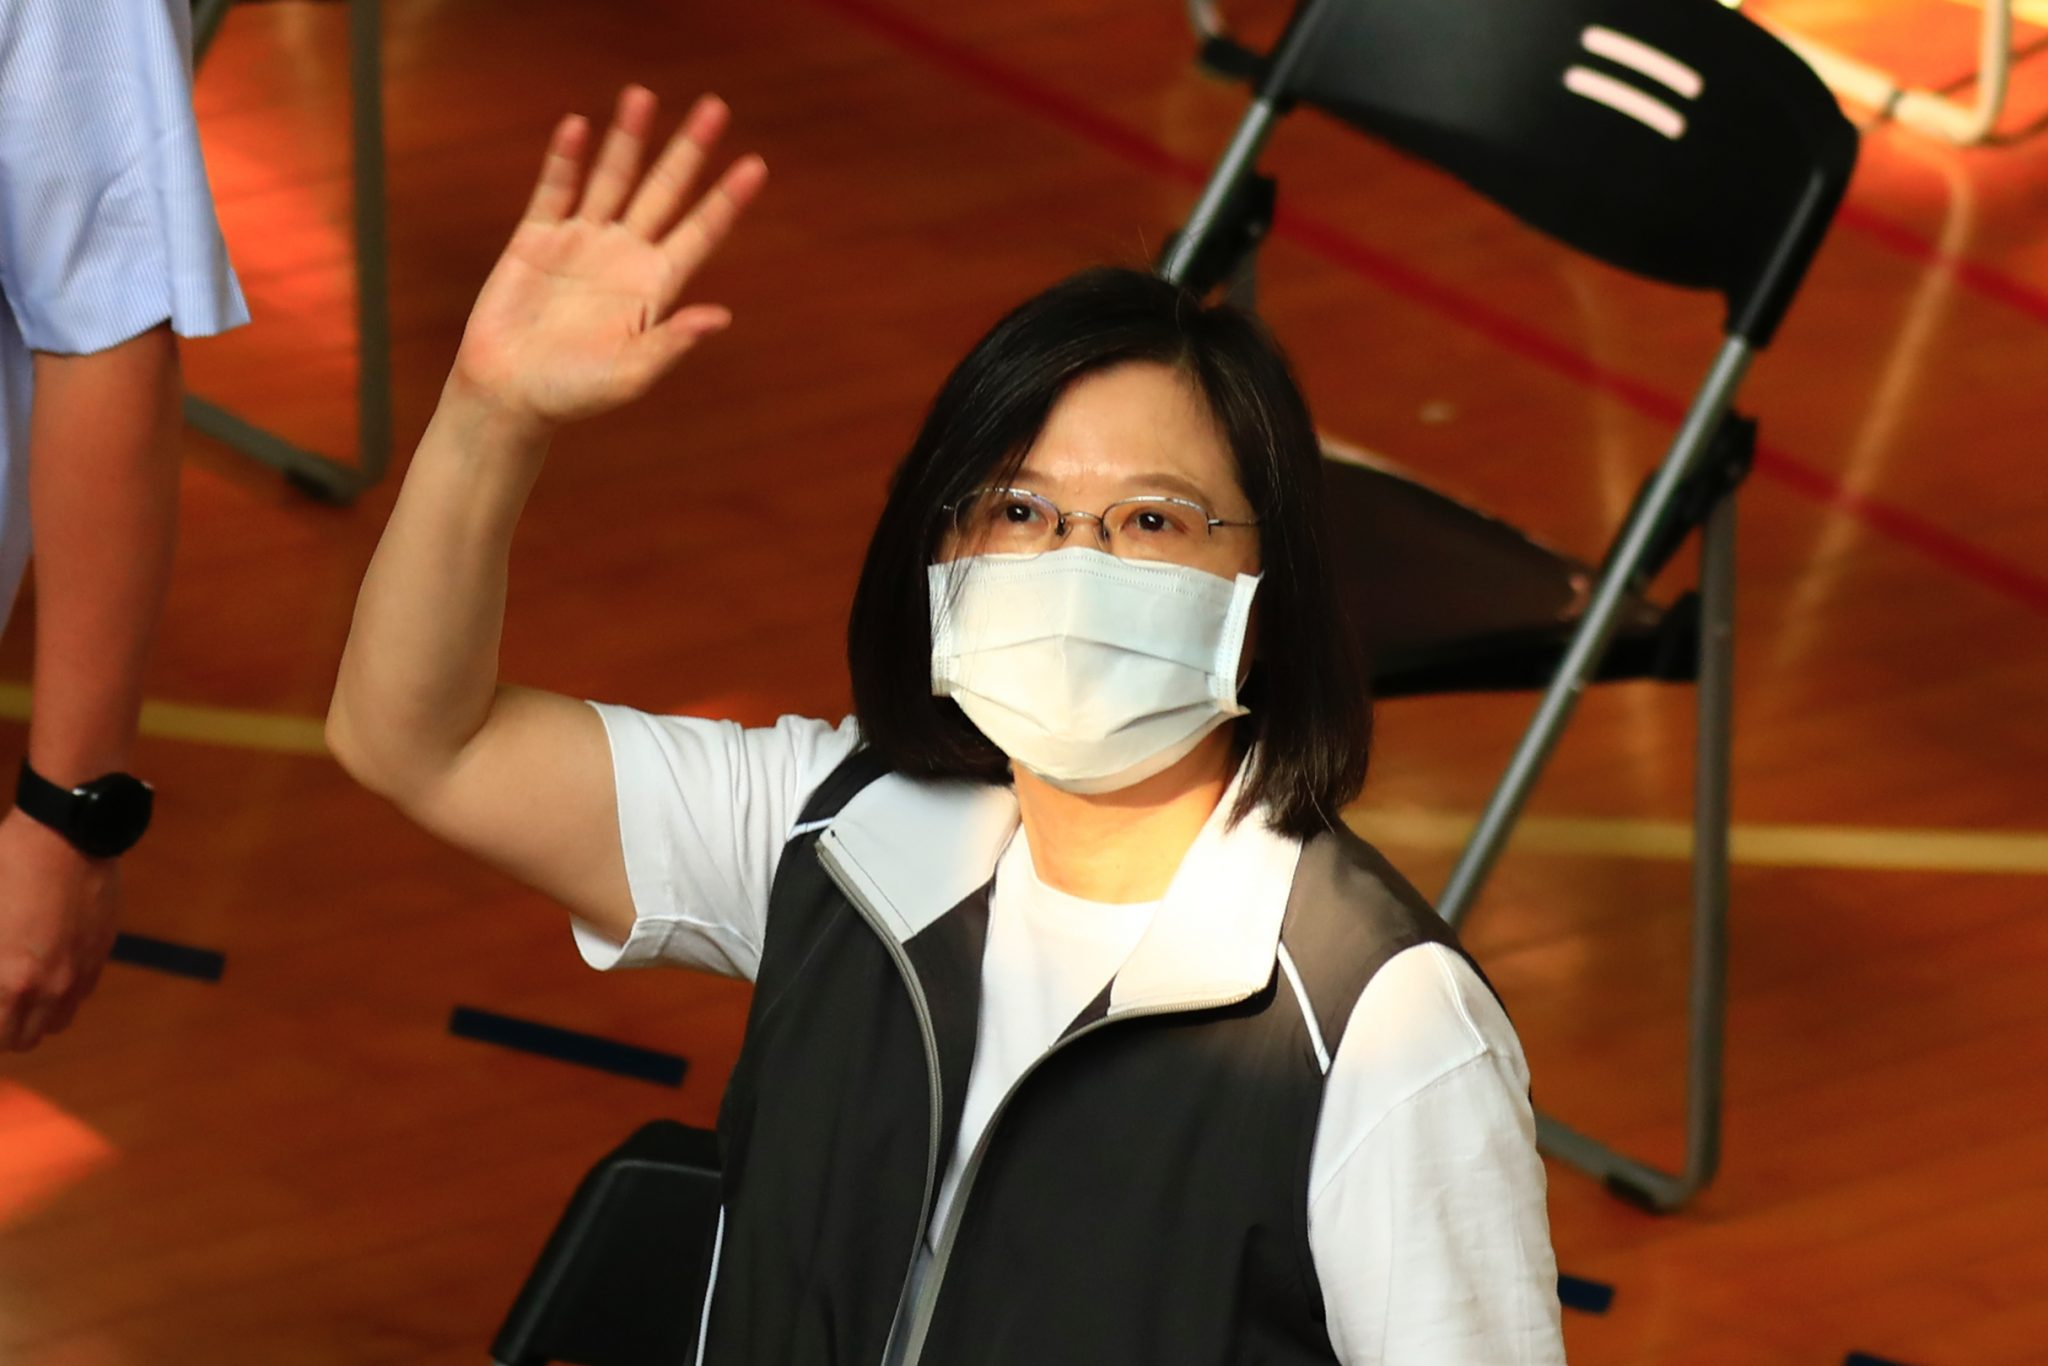 Taiwan's COVID-19 vaccine struggles